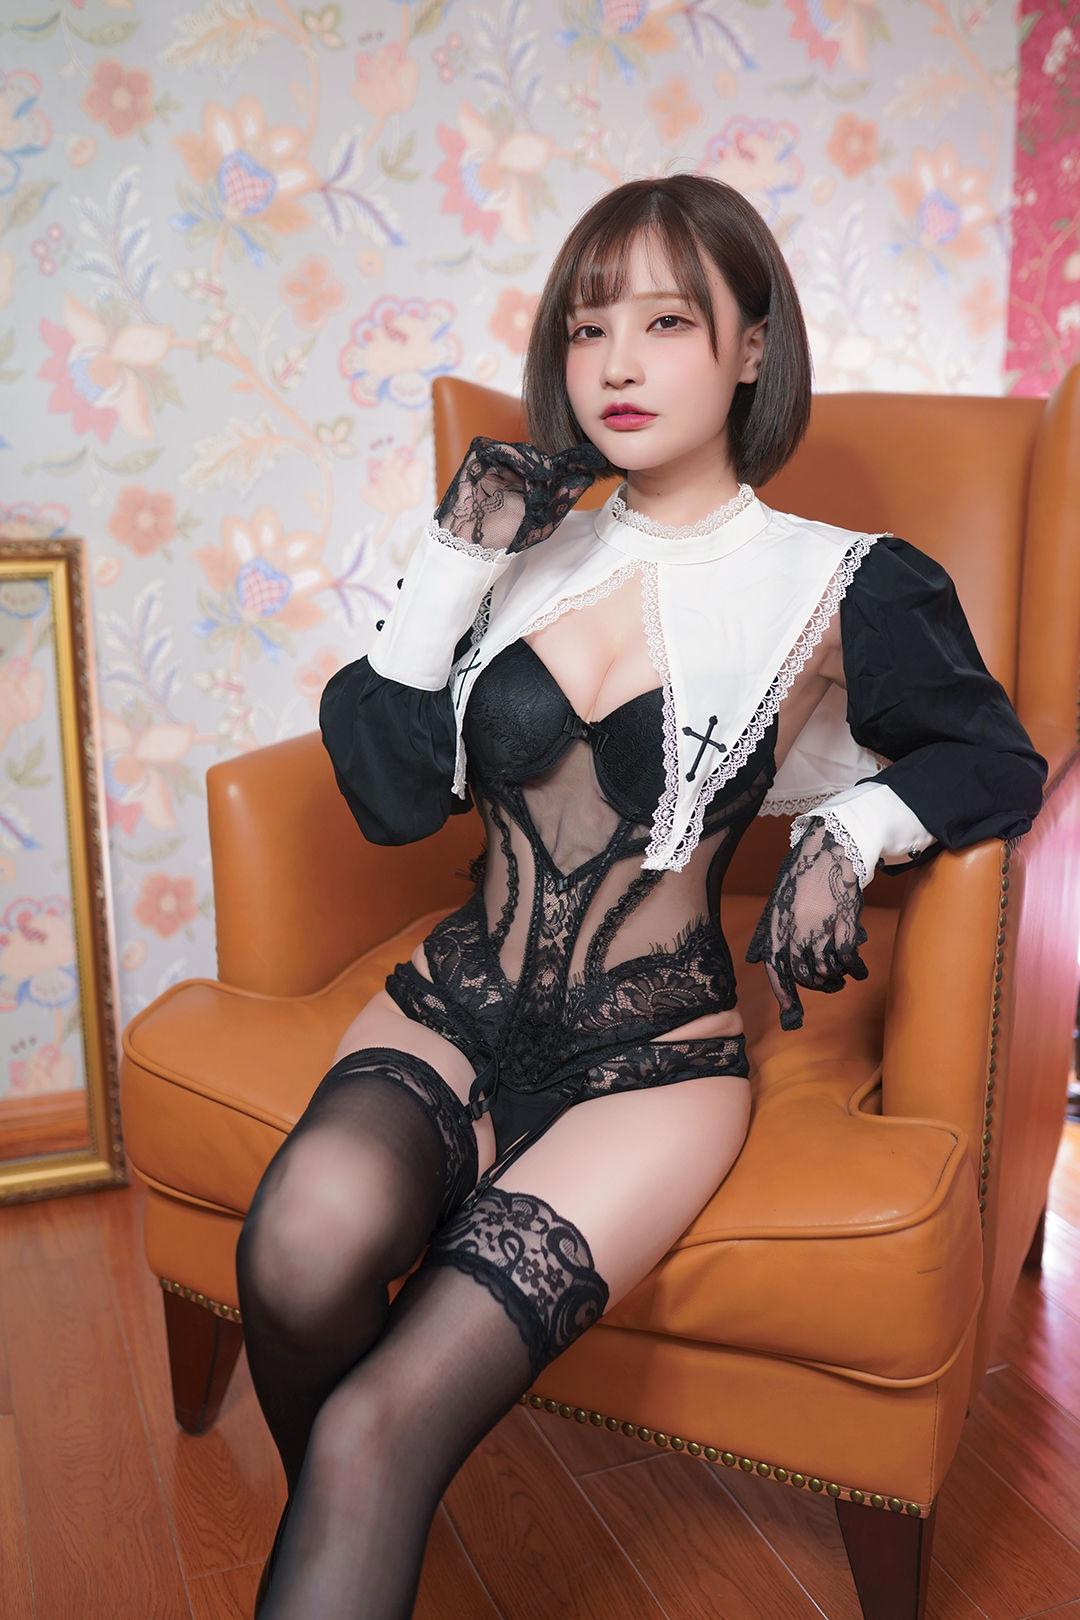 [COS福利] 千夜未来(Senya Miku)- 修道女 写真套图[30P]插图(1)